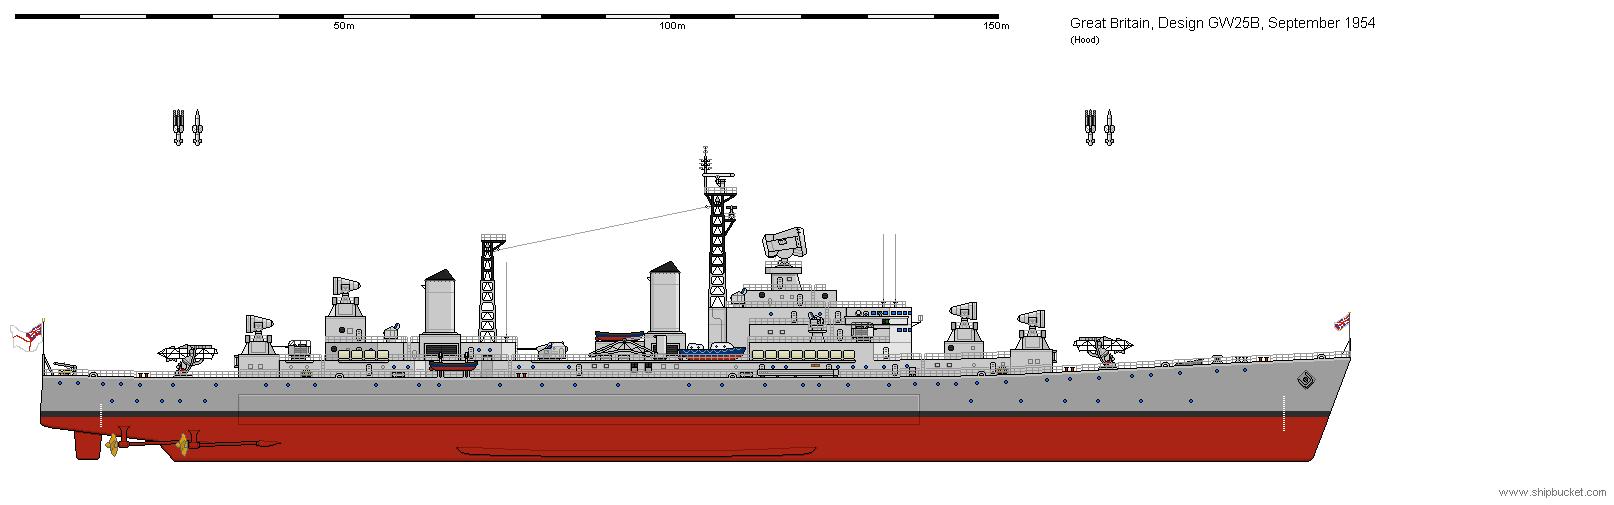 Shipbucket - Cruise ship drawings